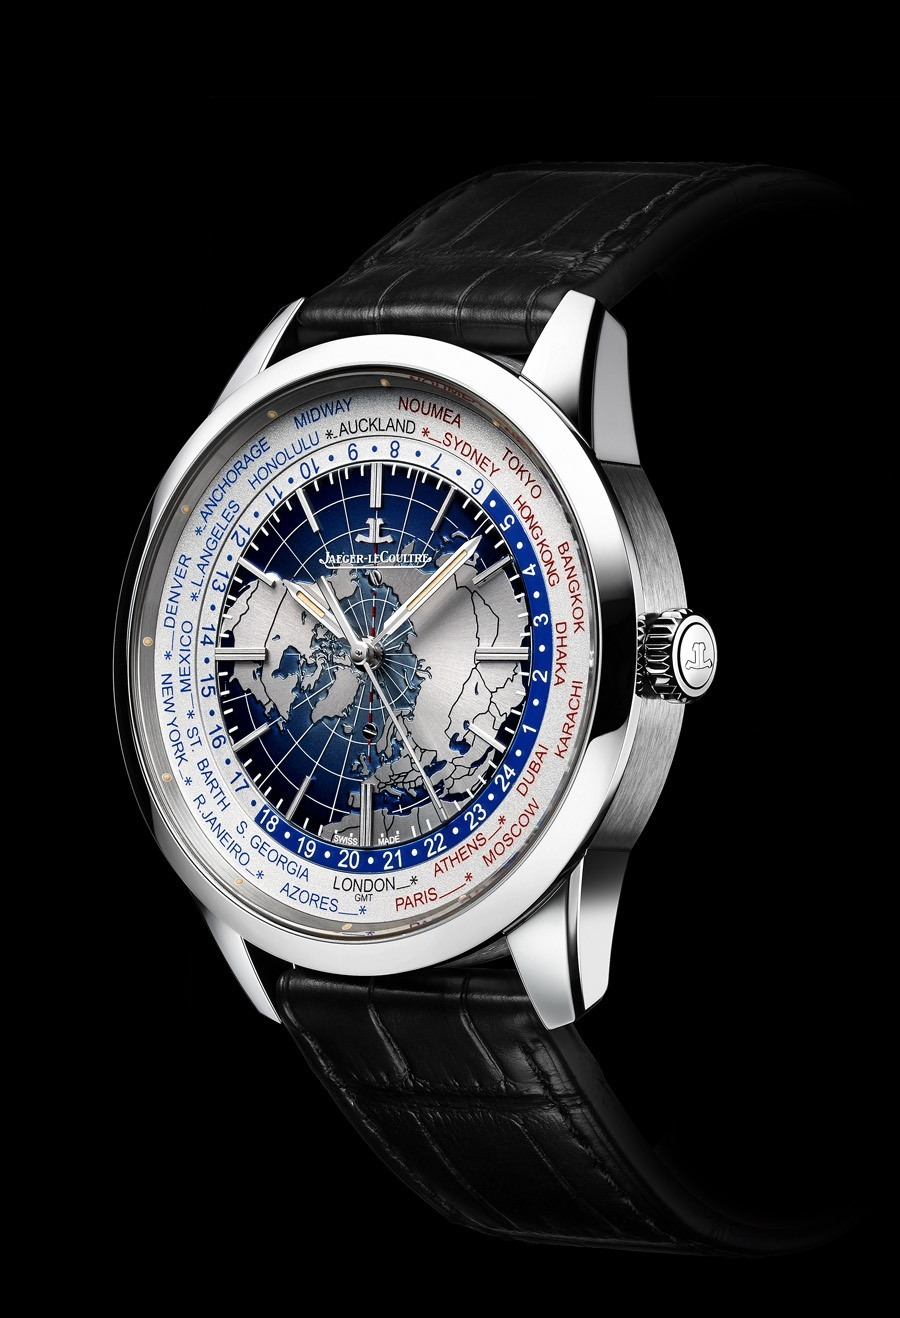 Jaeger-LeCoultre: Geophysic Universal Time in Edelstahl